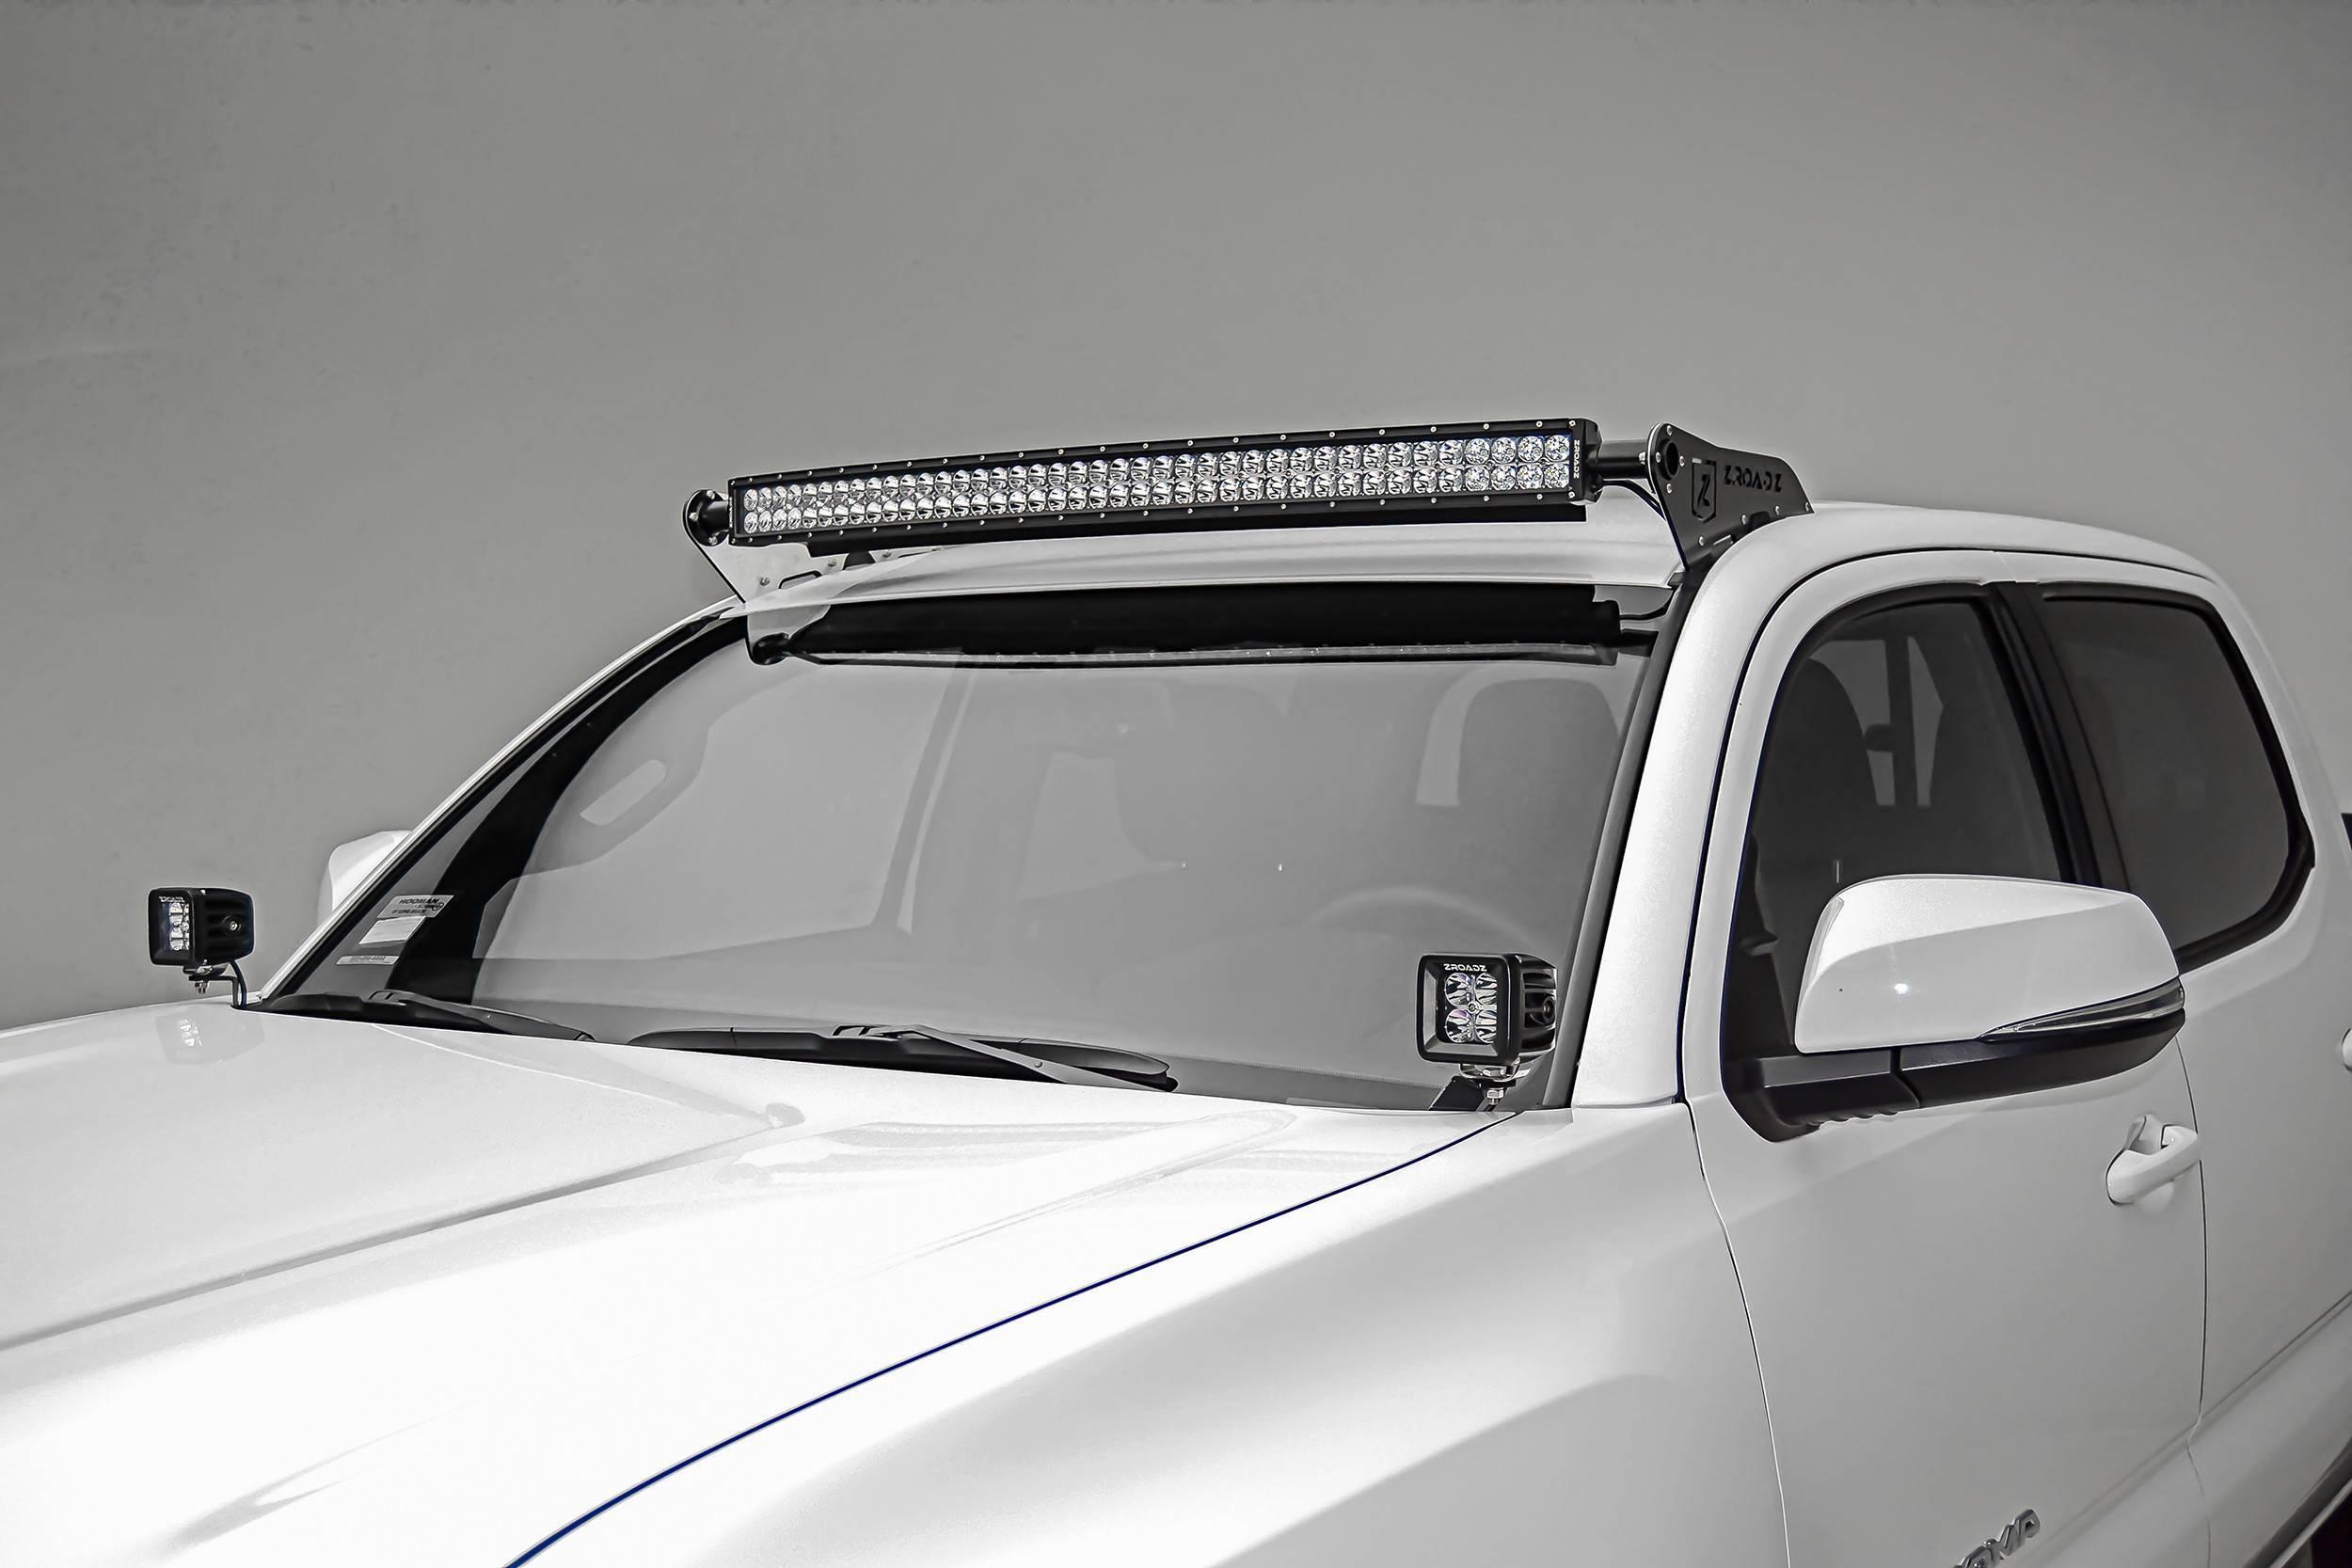 ZROADZ - 2005-2021 Toyota Tacoma Front Roof LED Bracket to mount 40 Inch Curved LED Light Bar - PN #Z339401